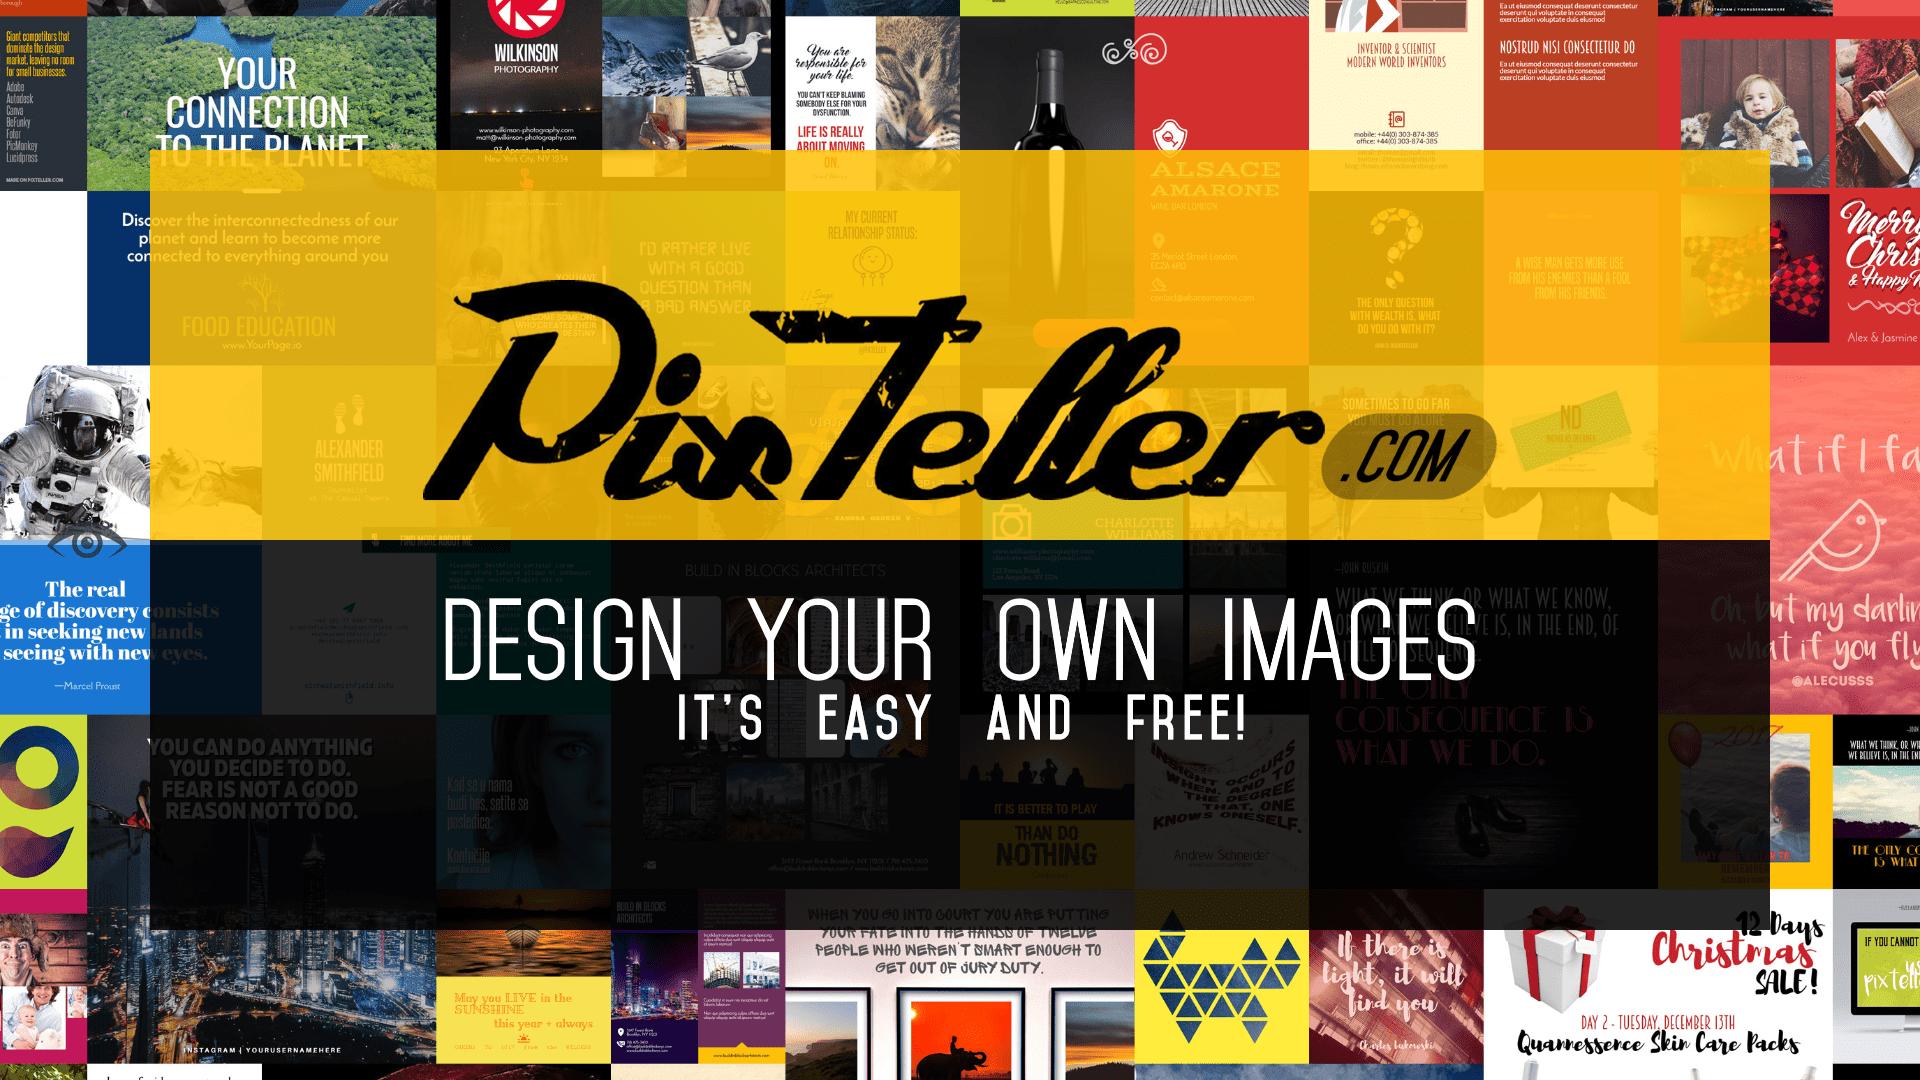 Advertising,                Display,                Product,                Font,                Brand,                PixTeller,                White,                Black,                Yellow,                 Free Image